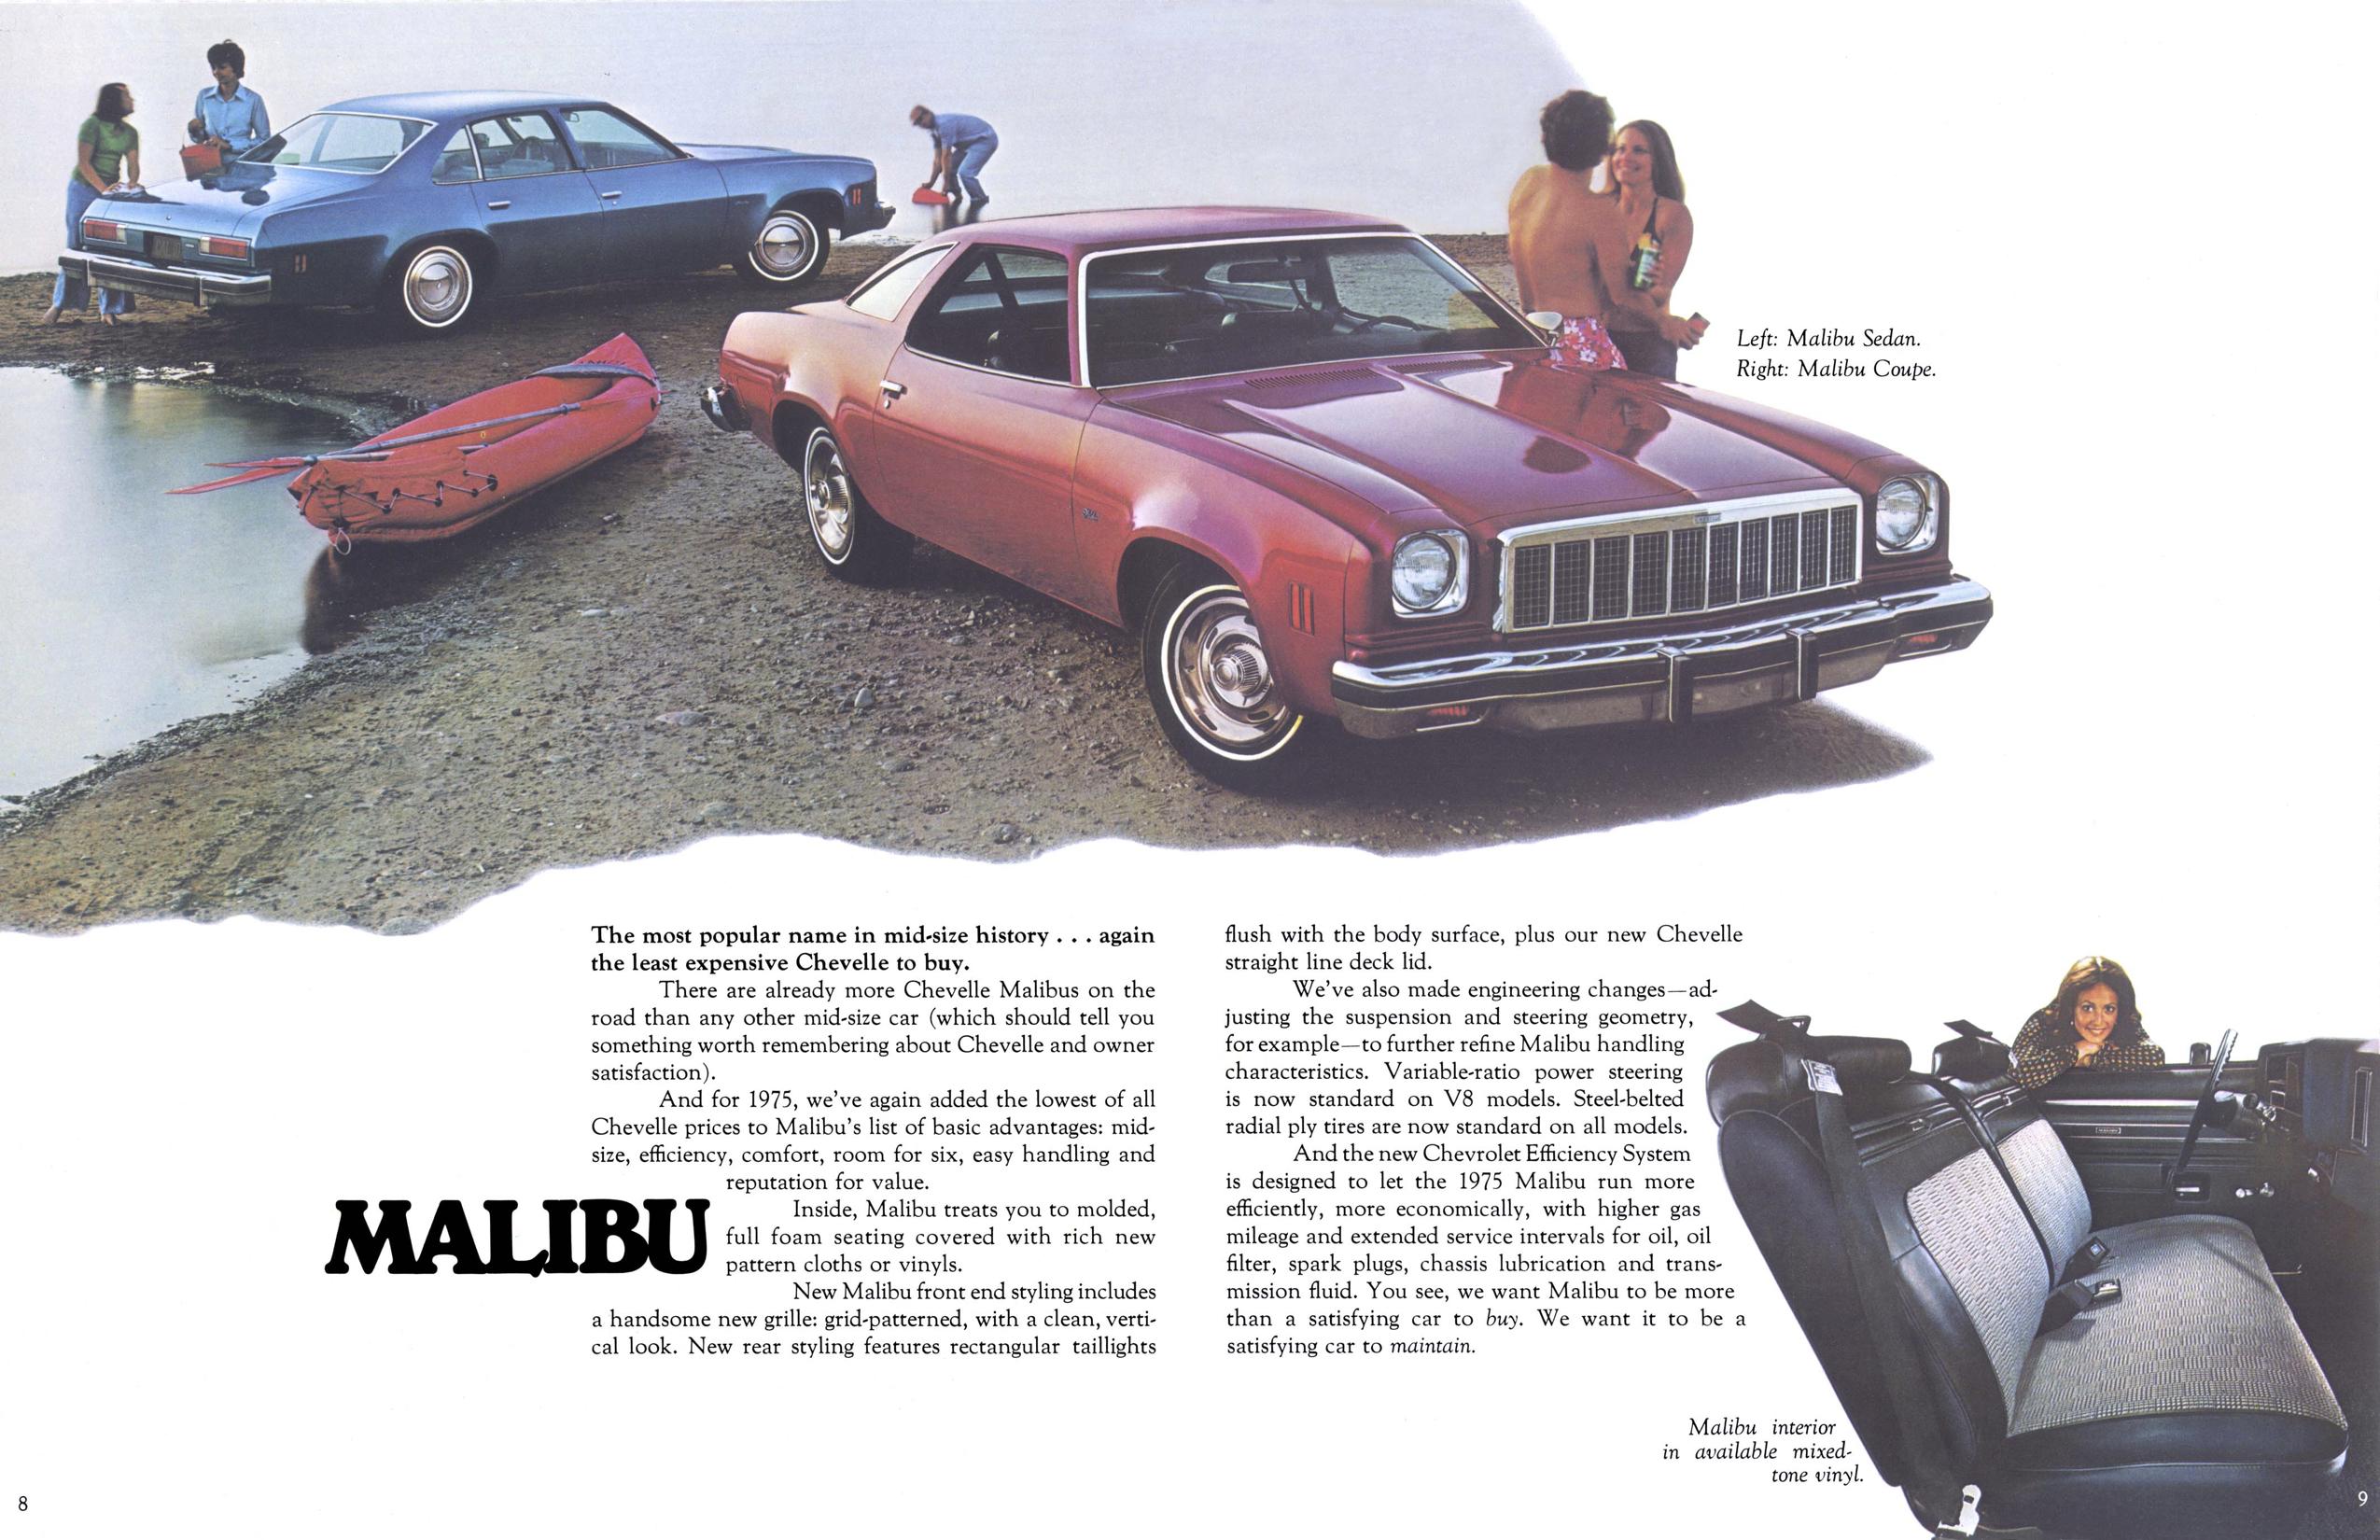 1975 chevelle malibu parts and restoration information1975 chevrolet chevelle brochure5